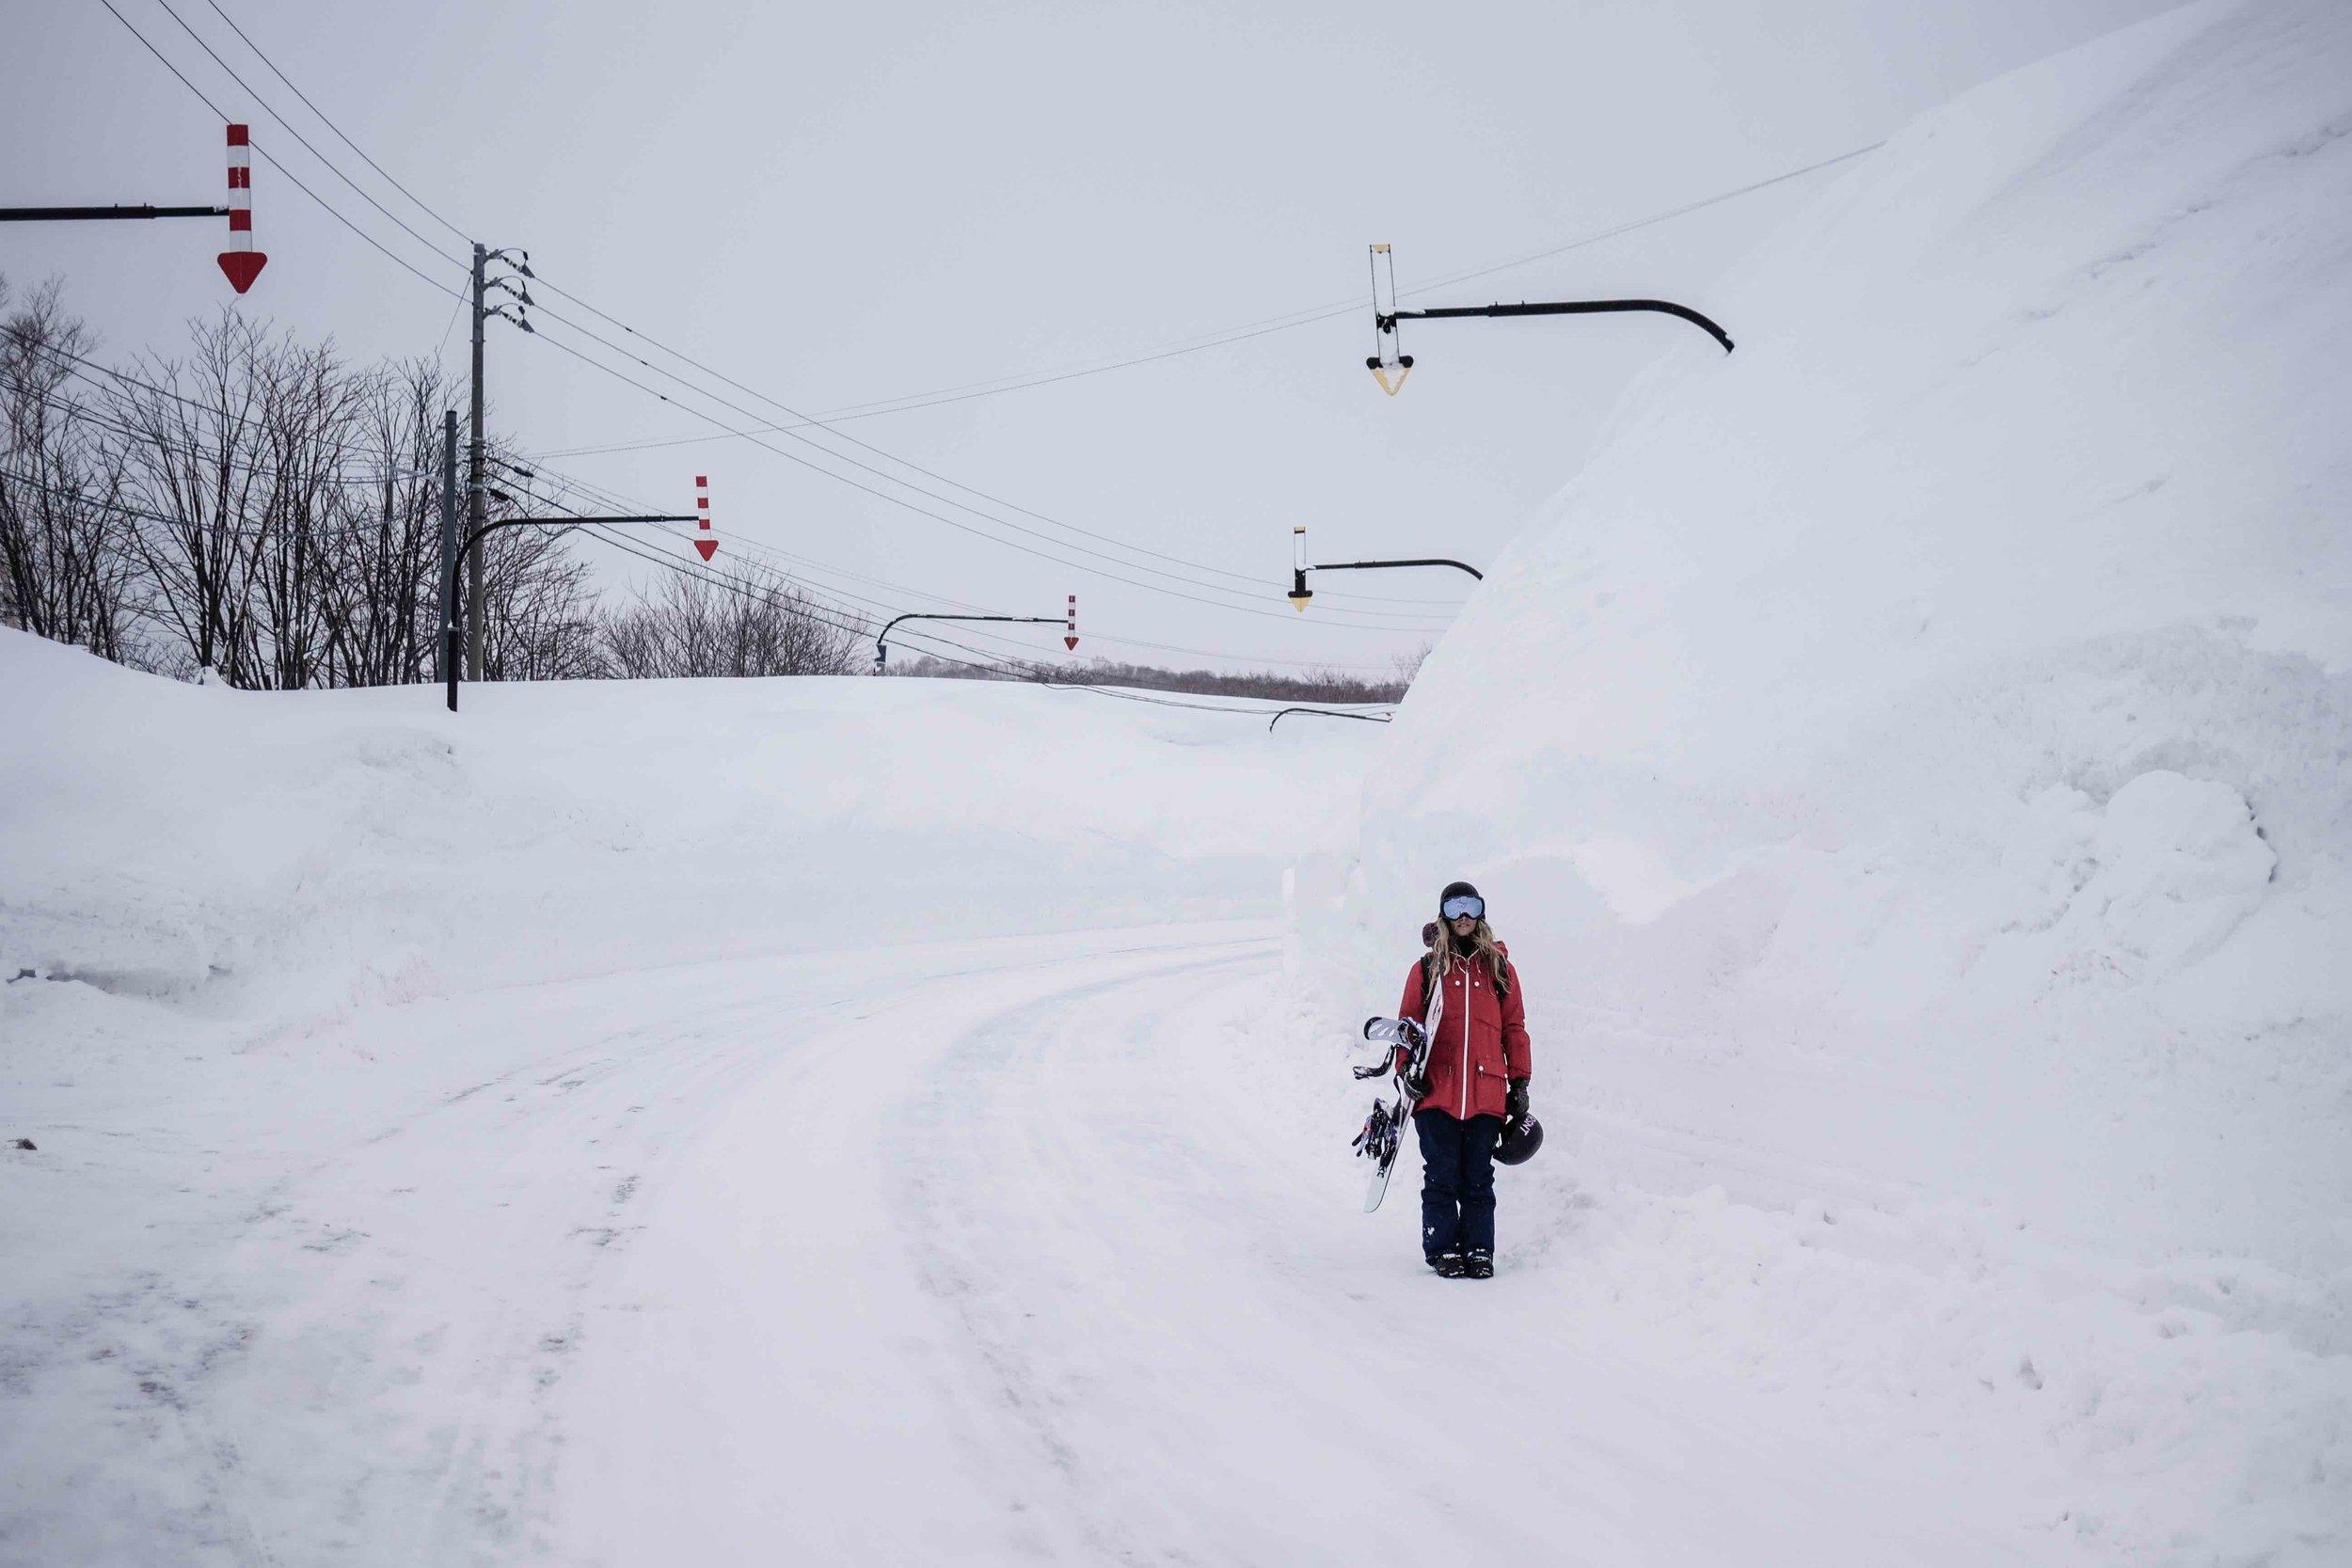 BPRSNT CHANELLE SLADICS SNOWBOARDING JAPAN POWDER 4.jpg